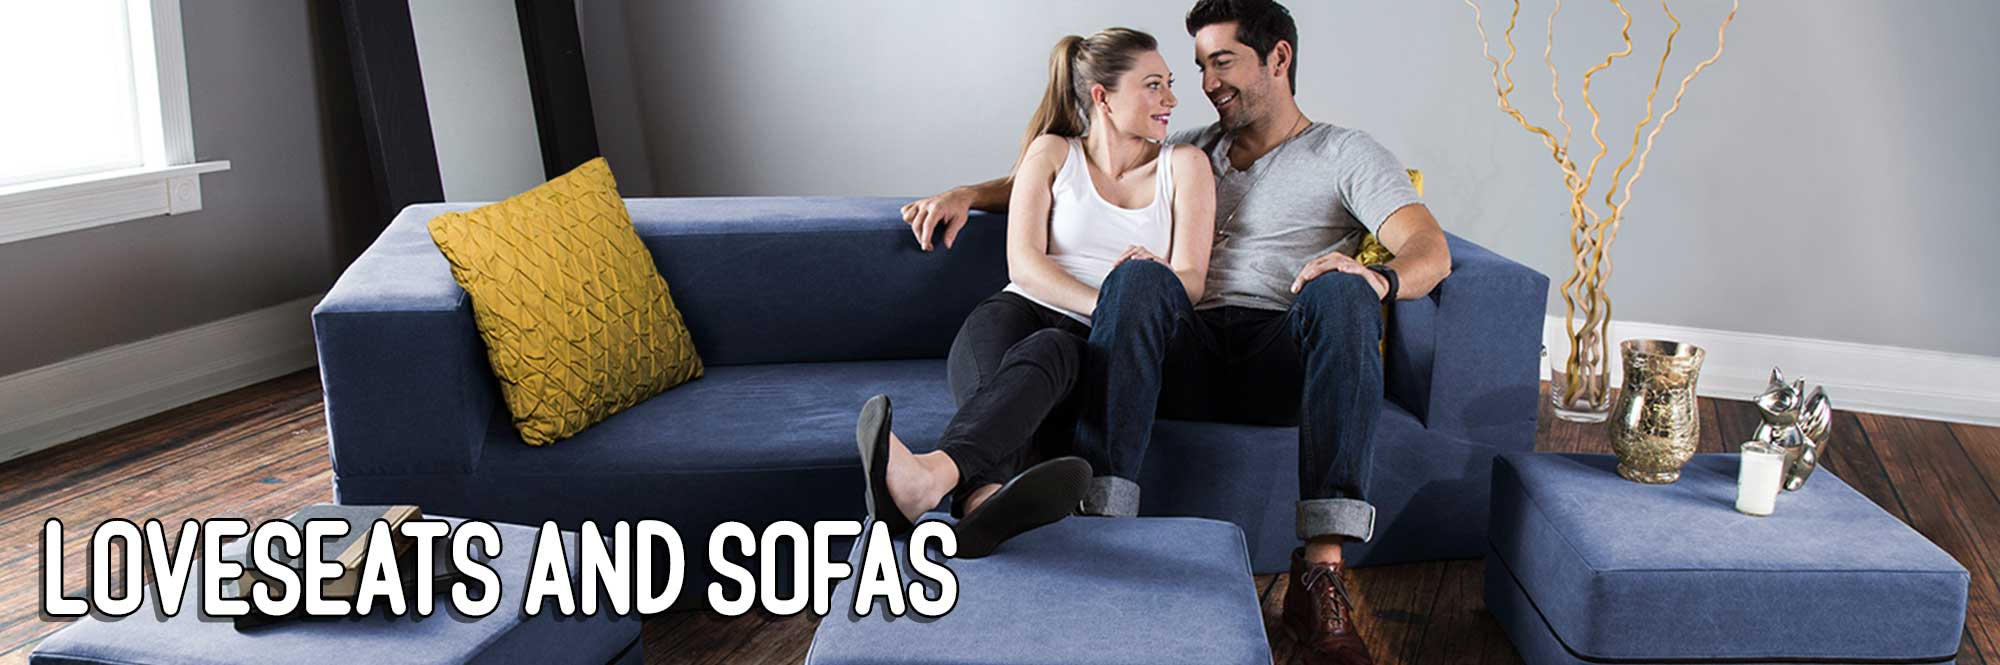 Loveseats & Sofas